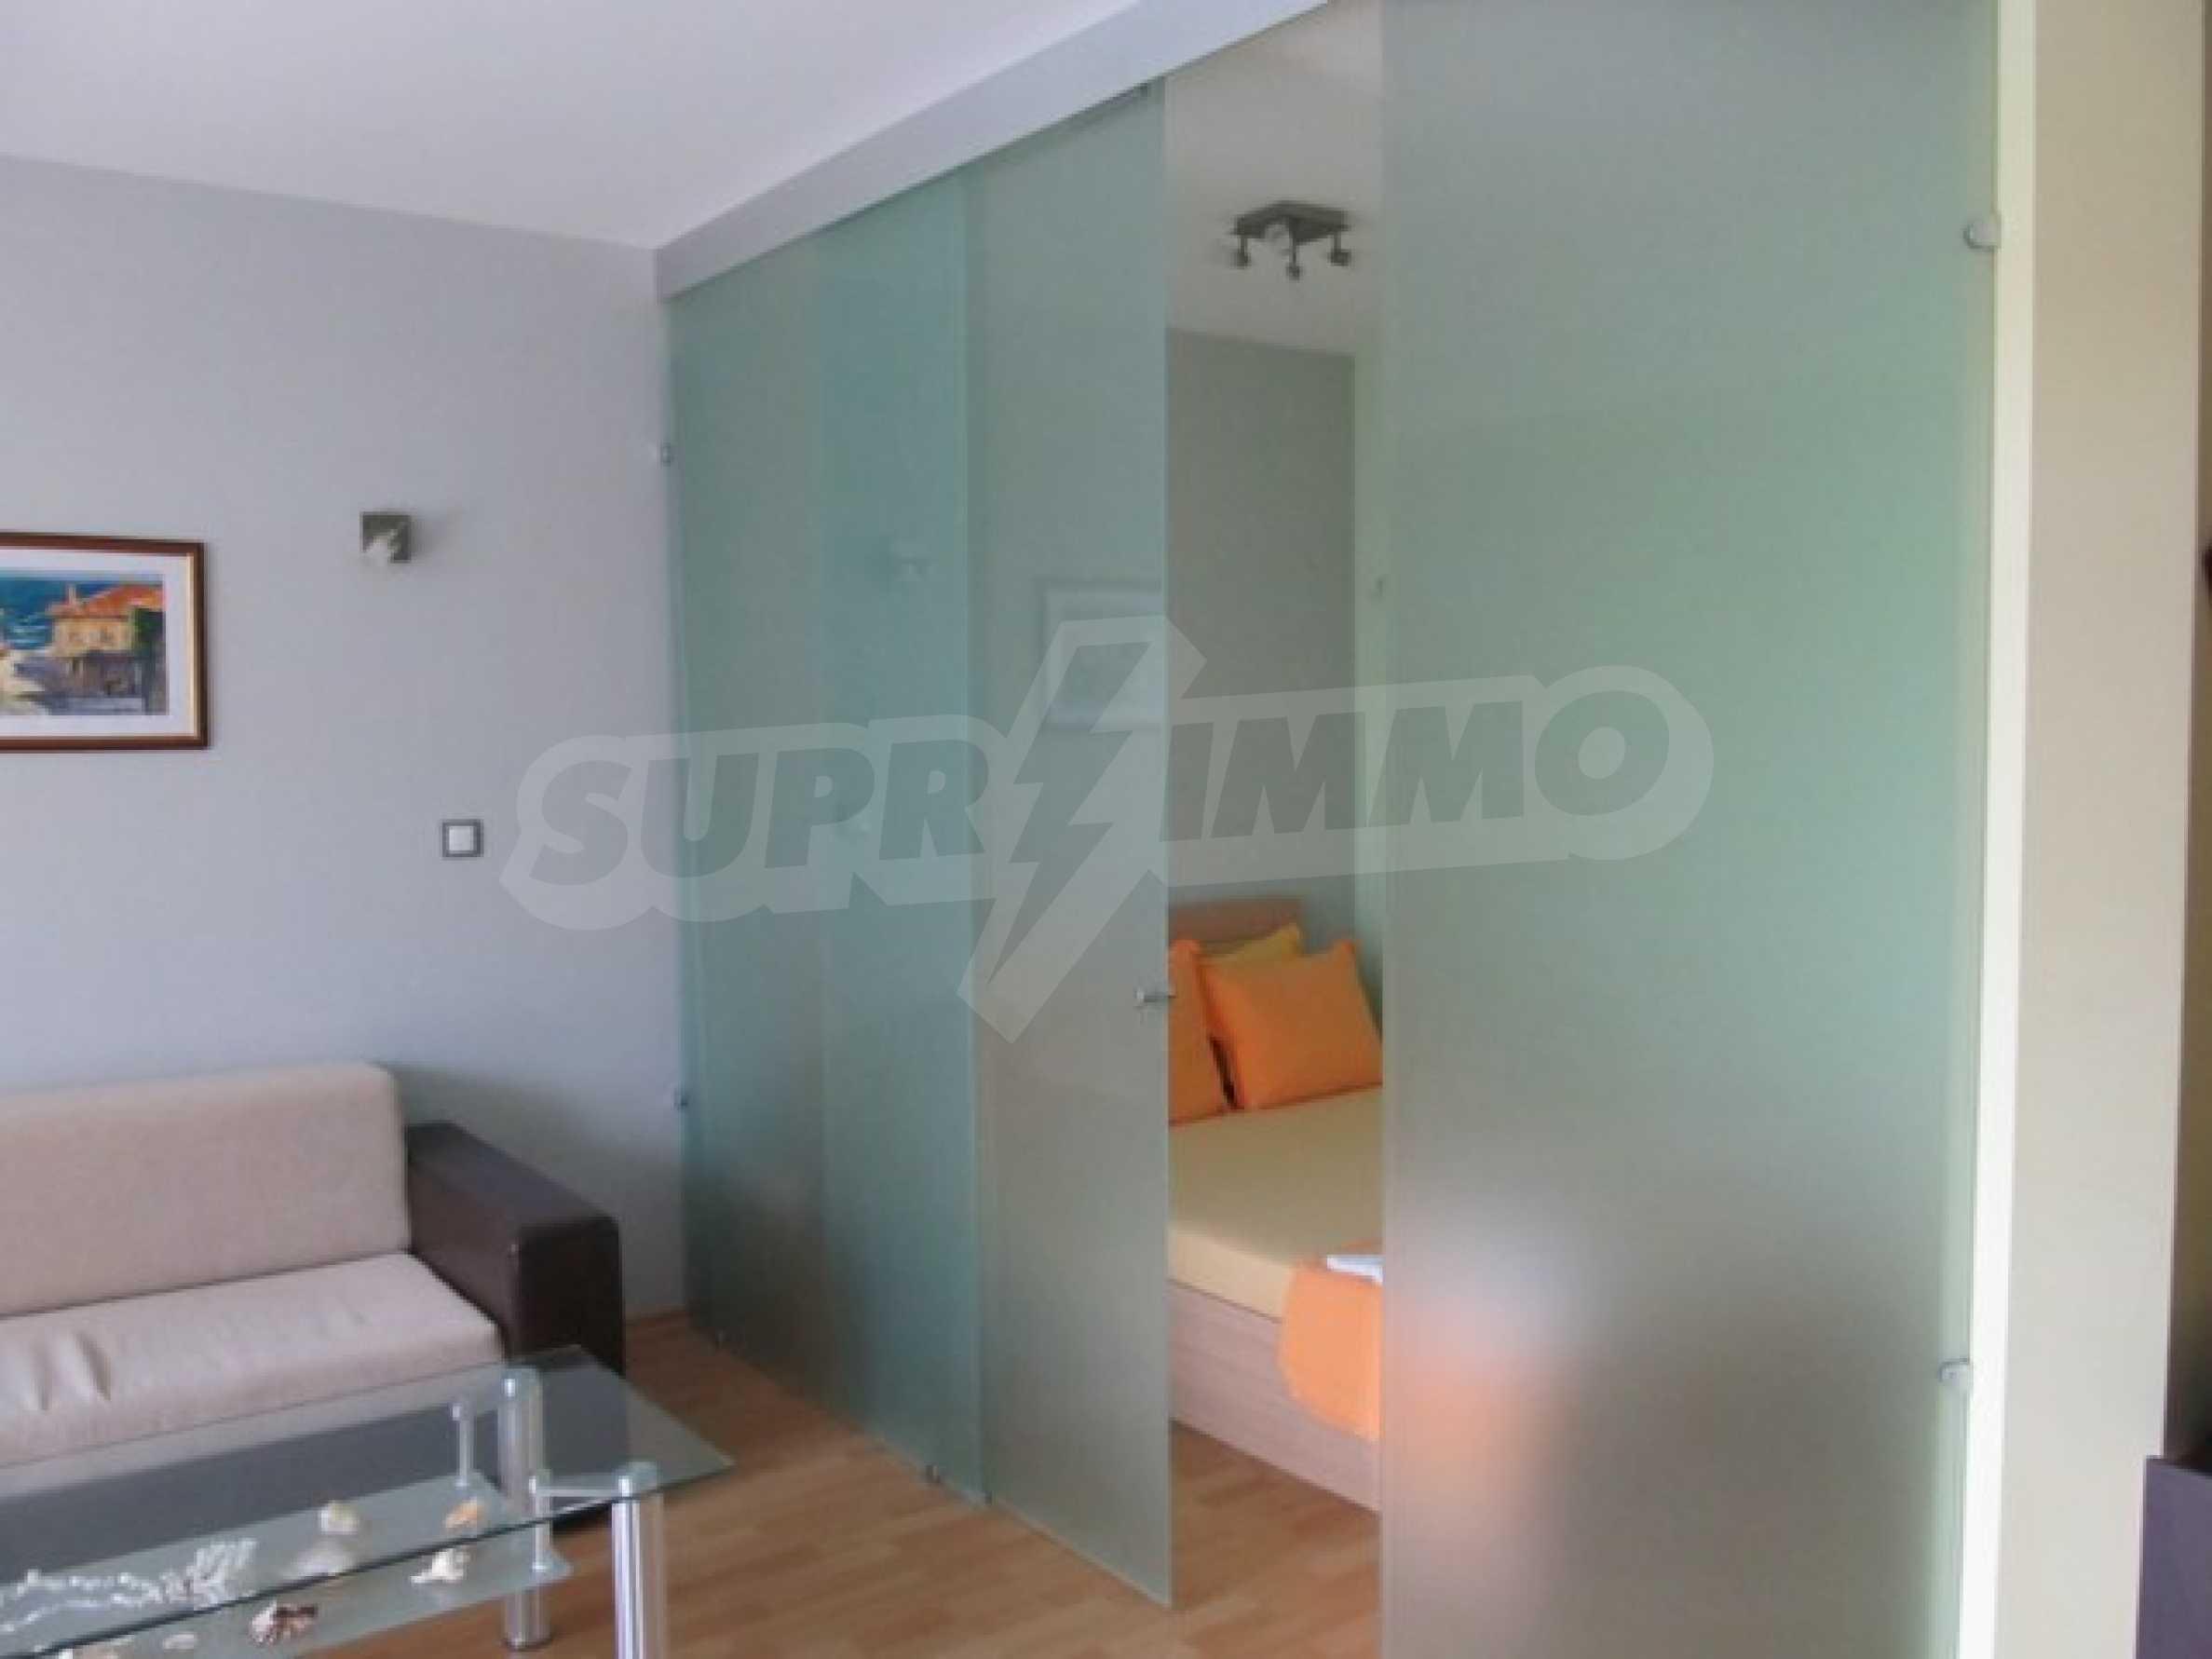 Тристаен апартамент за продажба в Поморие 16